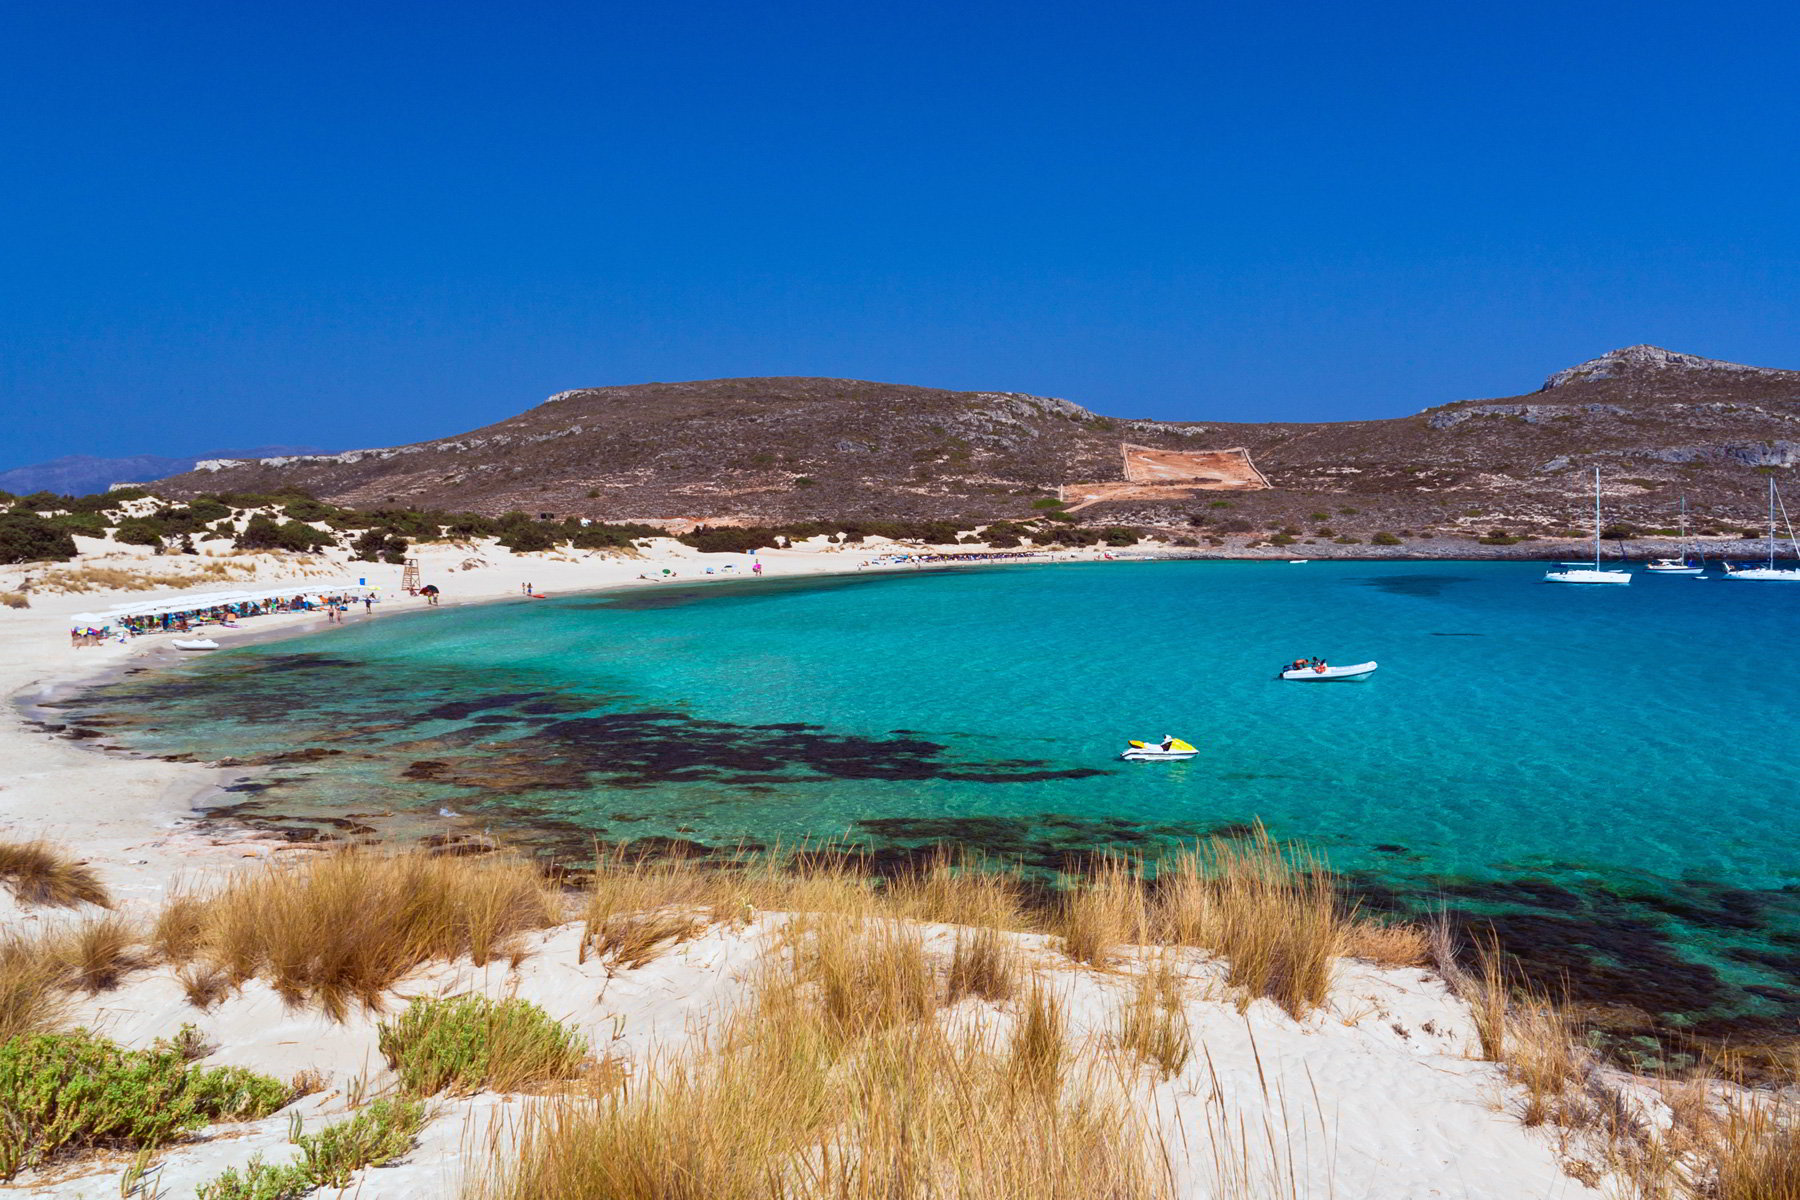 11_simos_beach_elafonisos_laconia_region.jpg